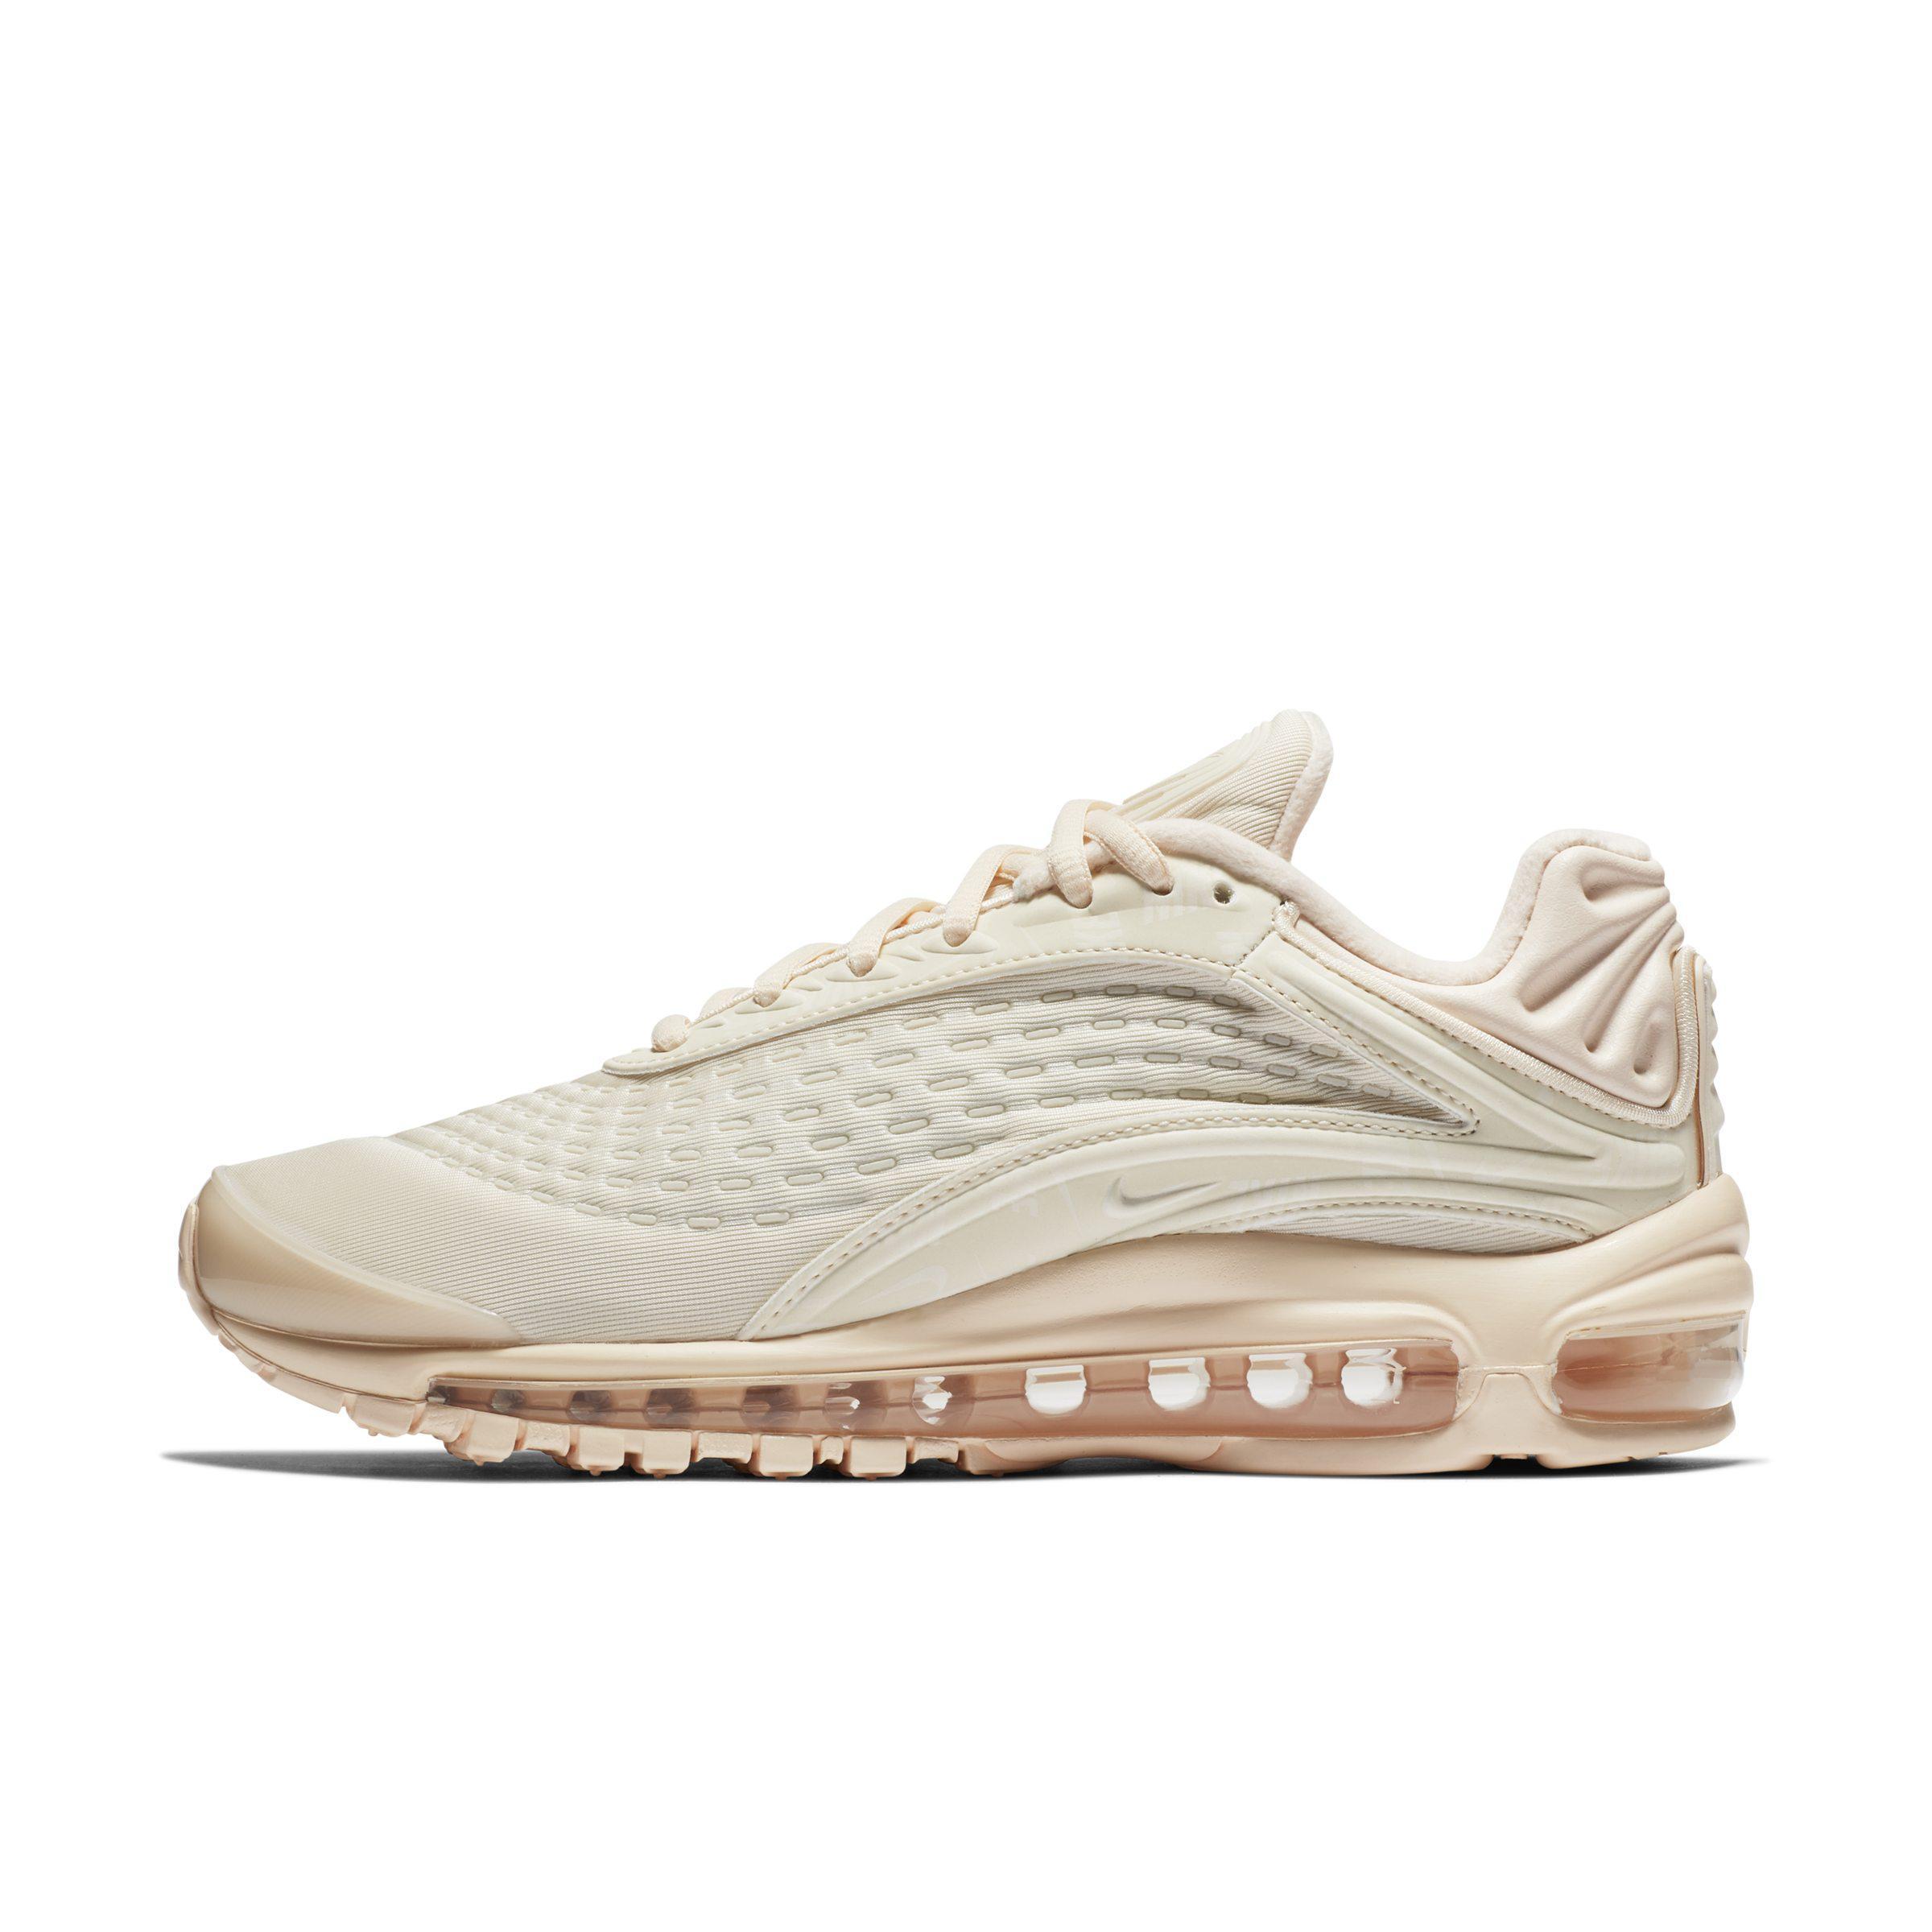 Nike Air Max Deluxe Se Sneaker - Lyst